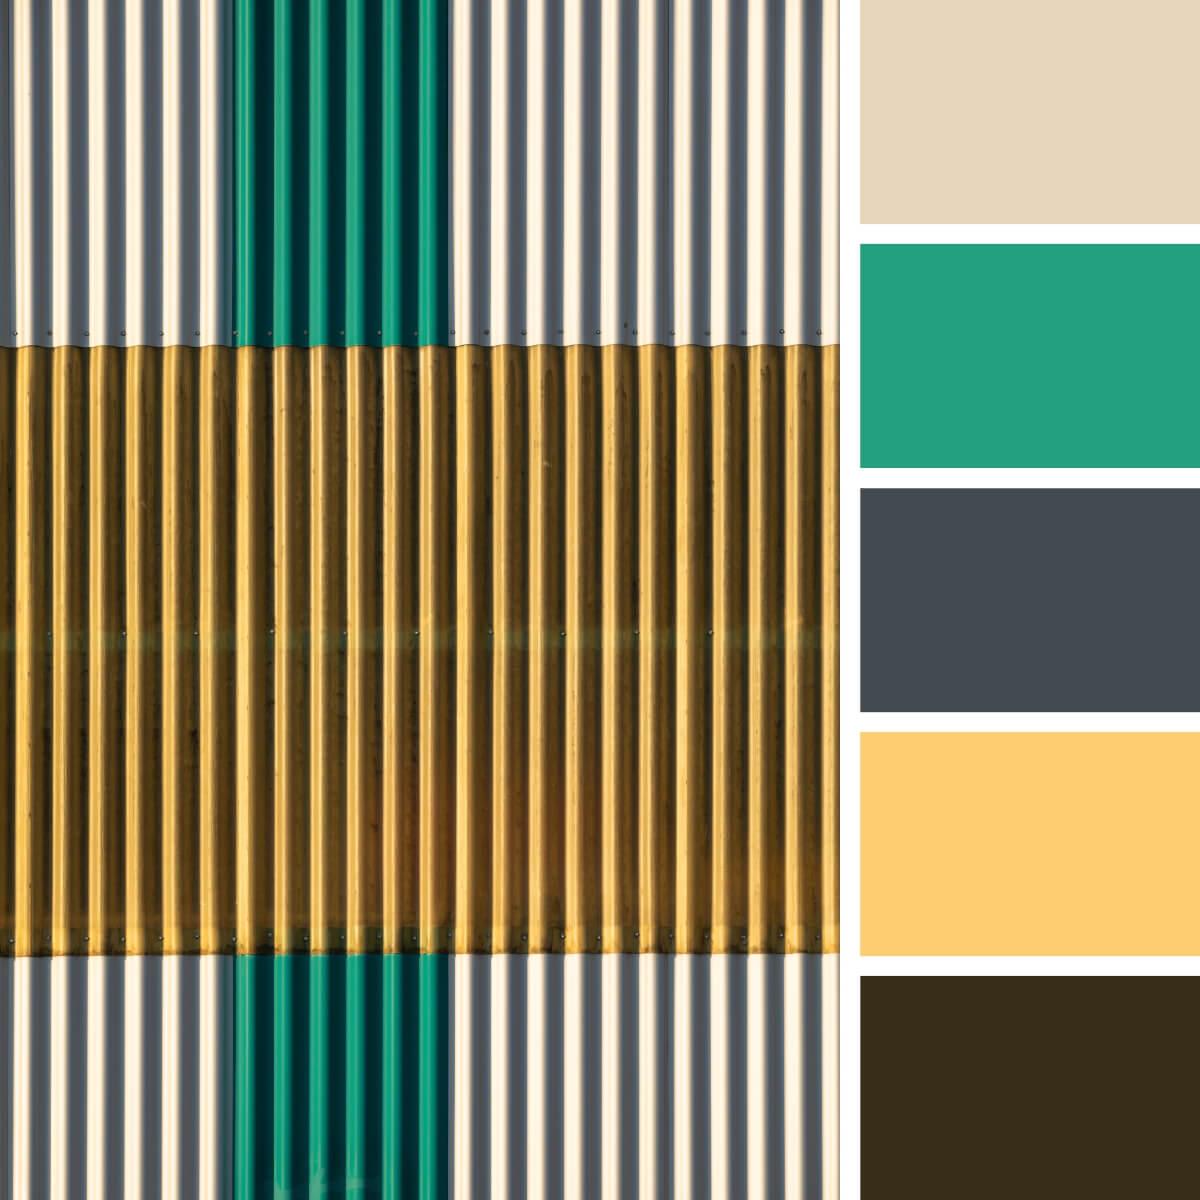 Basic Green, Yellow & Gray